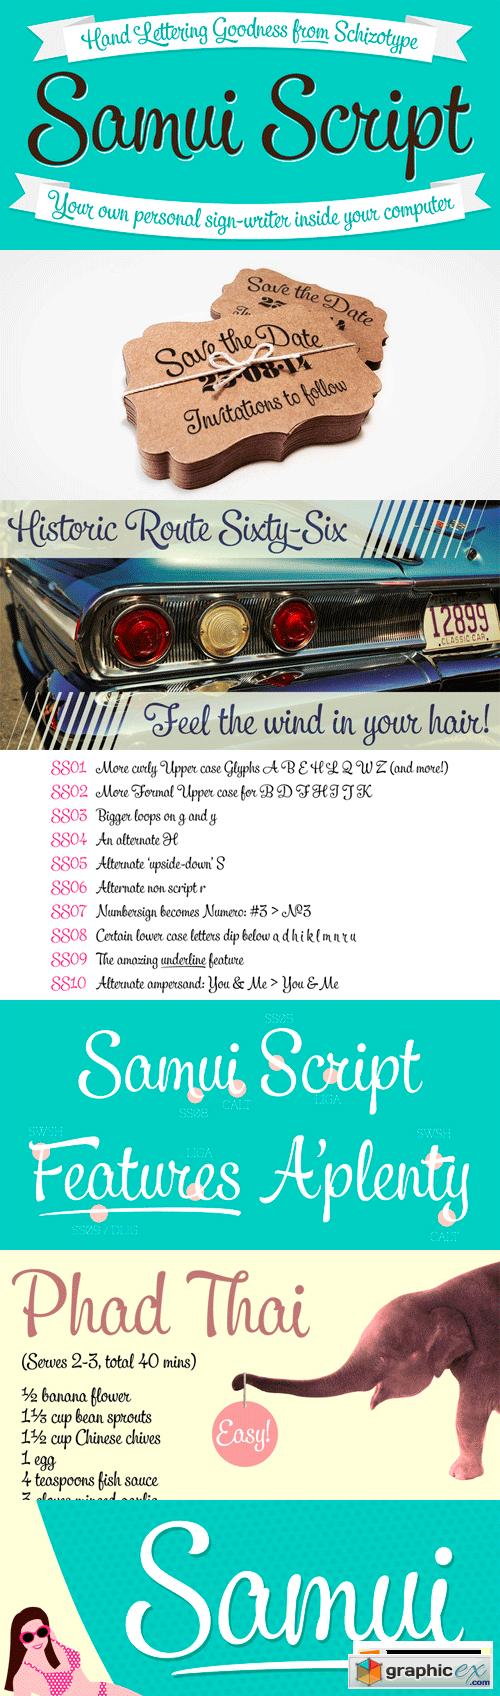 Samui Script Font for $60 » Free Download Vector Stock Image